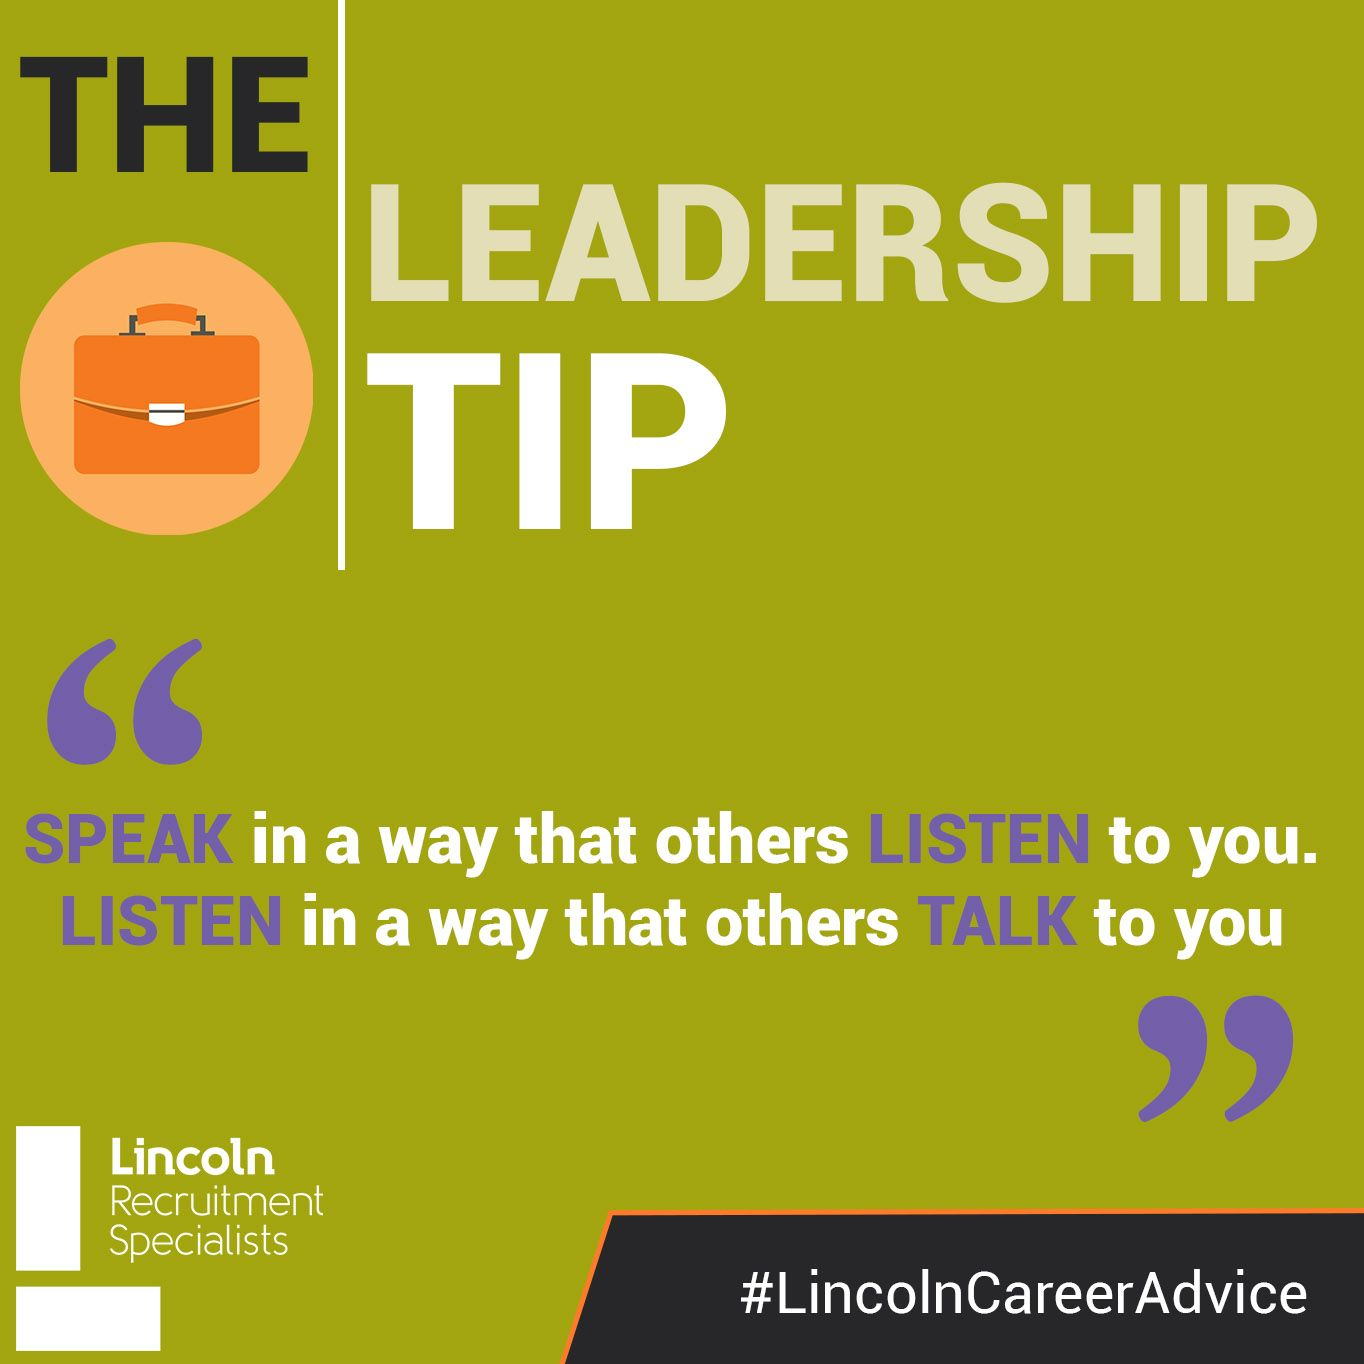 leadershiptip careeradvice (With images) Job hunting